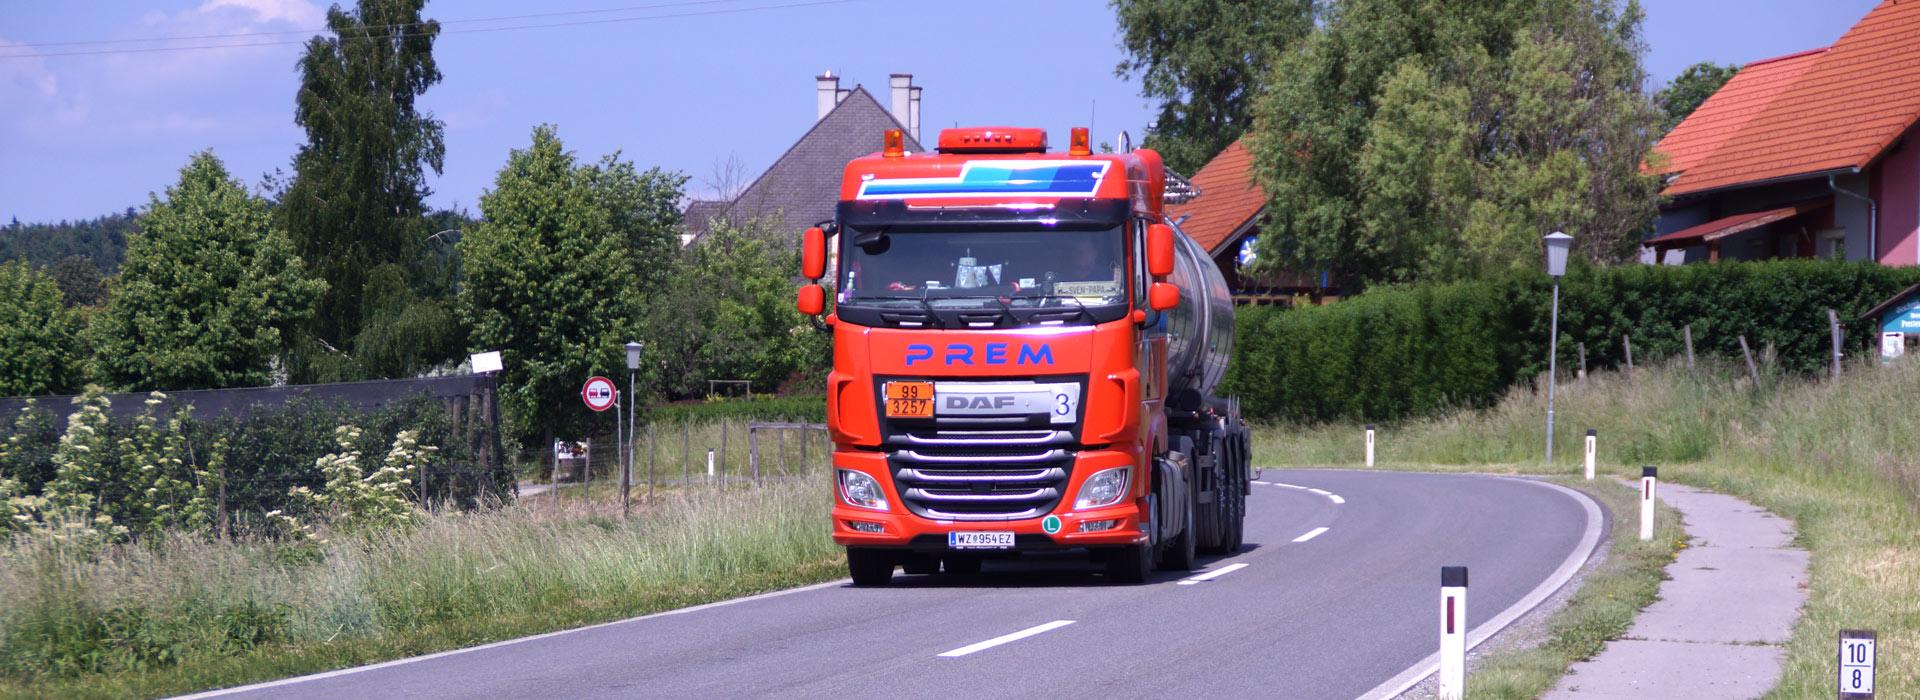 prem-transporte131